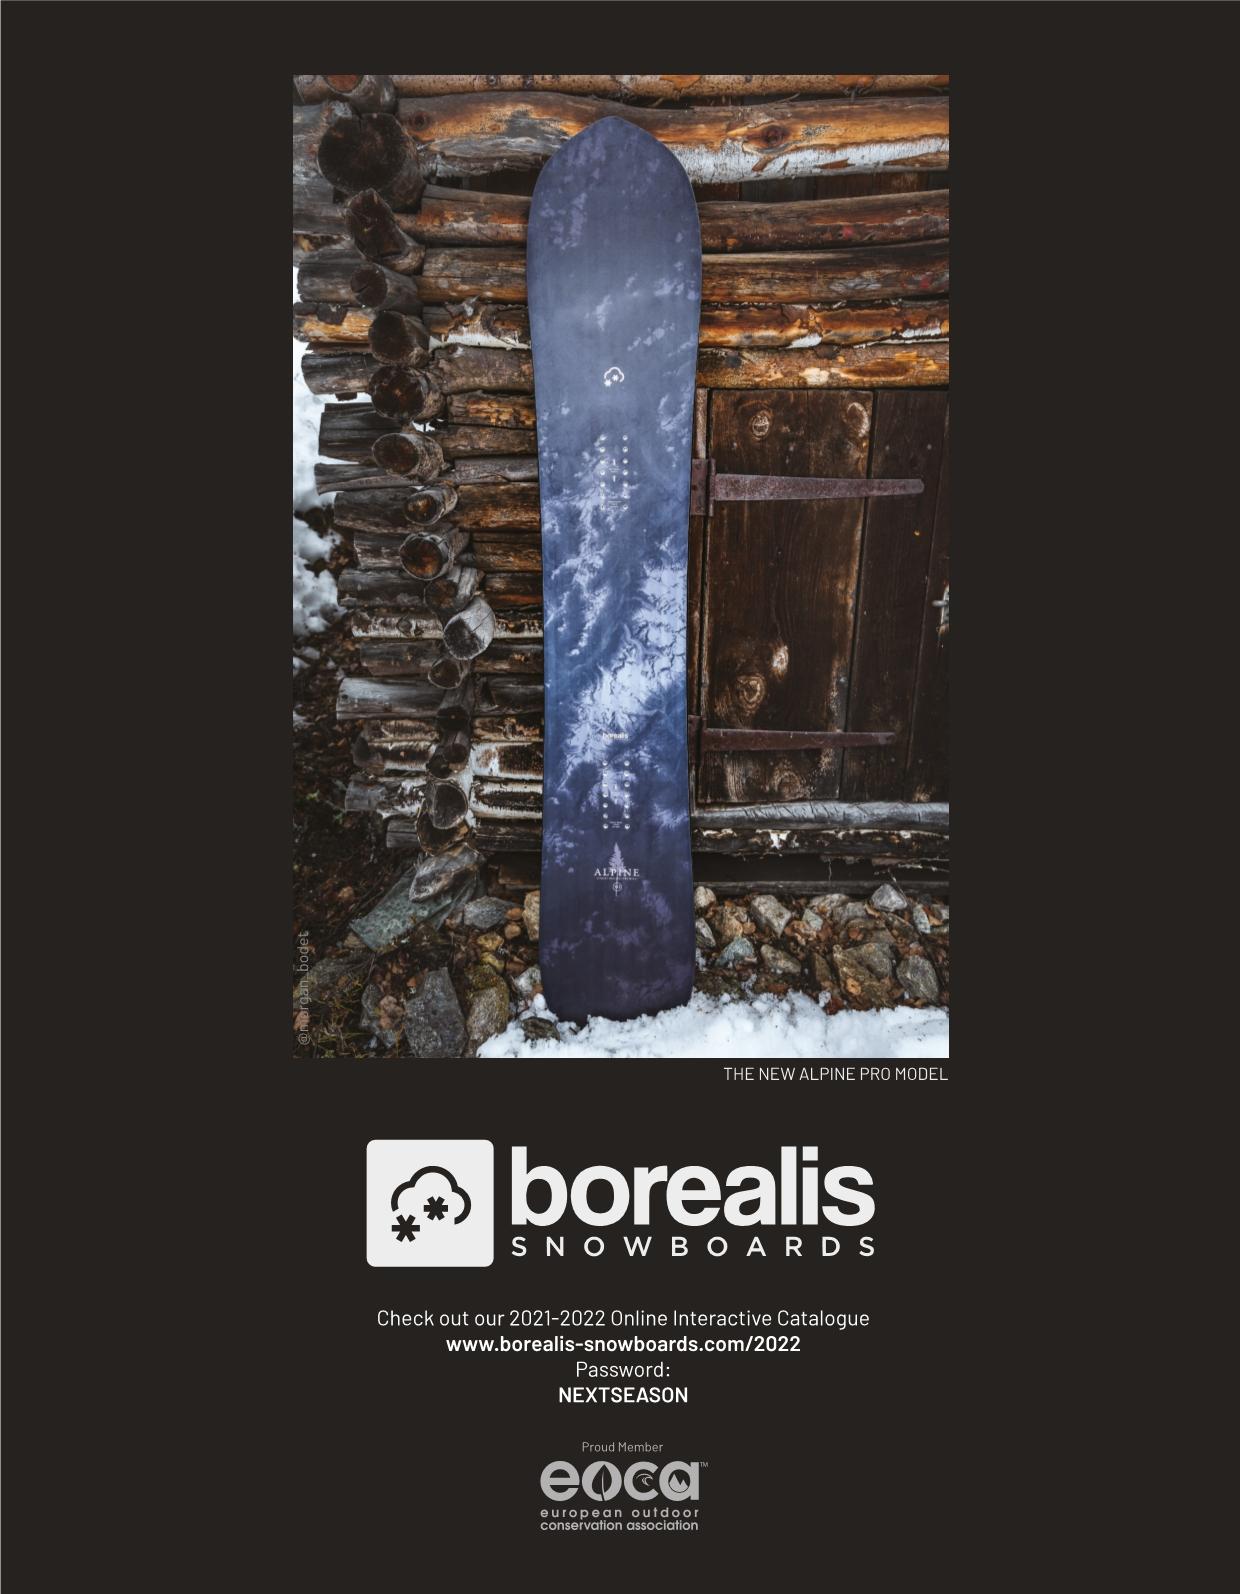 105 Borealis snowboards